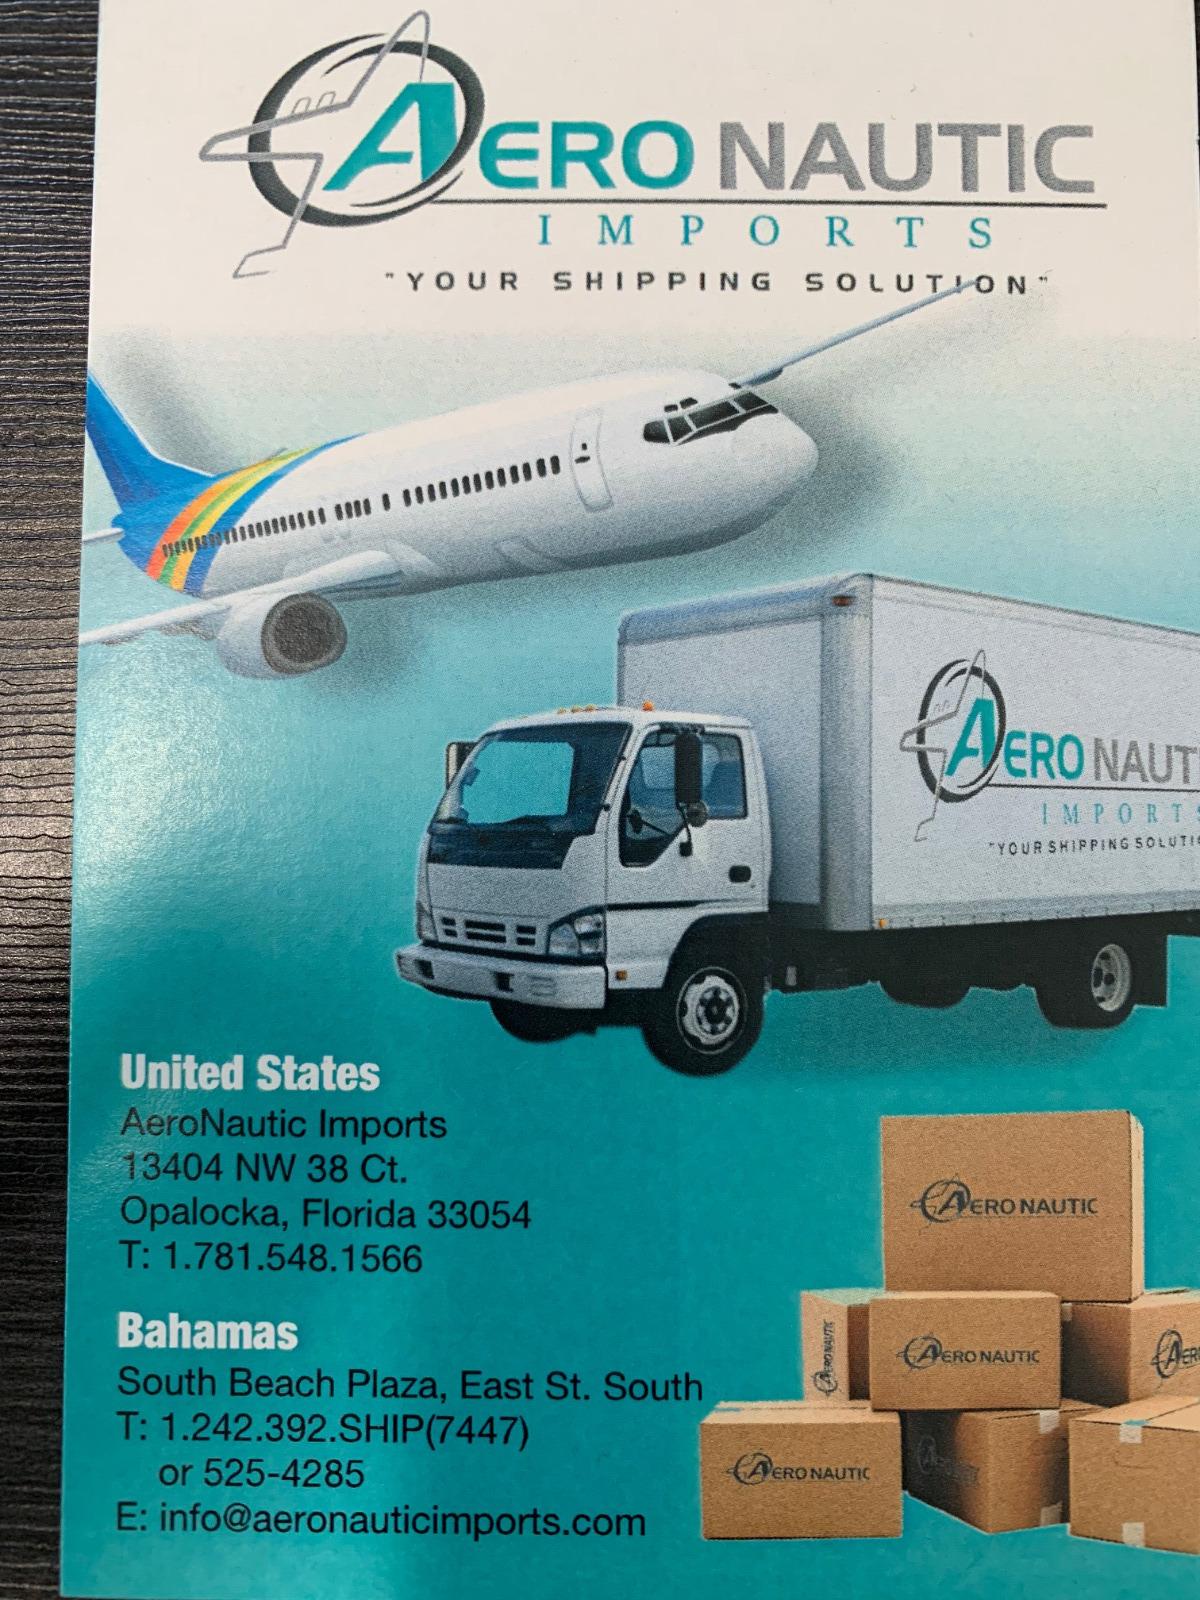 Aero Nautic Imports